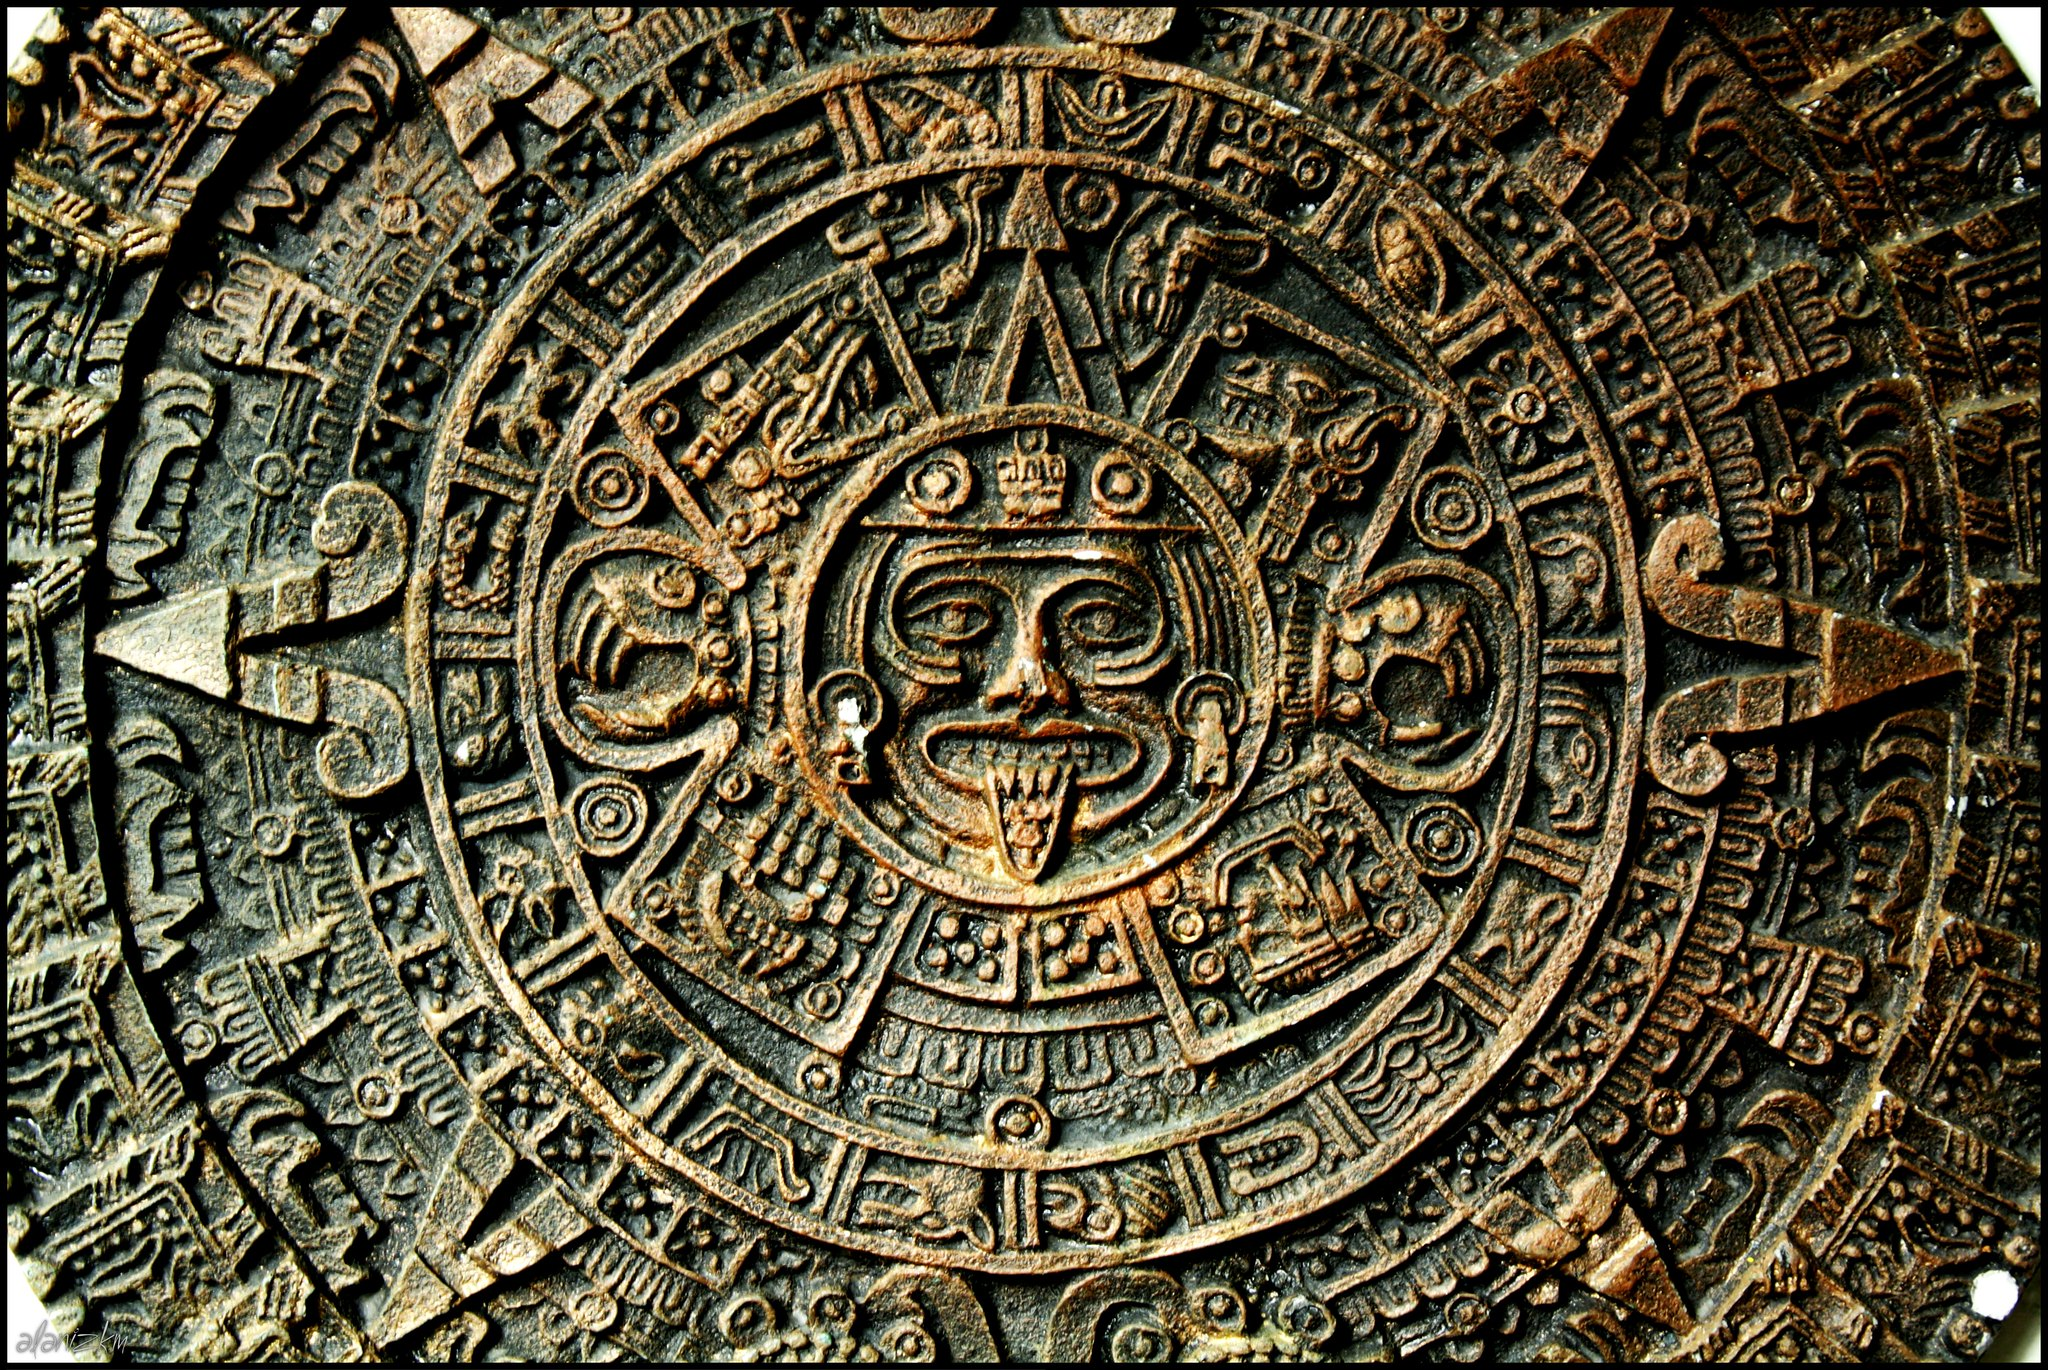 Aztec Calandar Sun Stone | Flickr - 1914.4KB